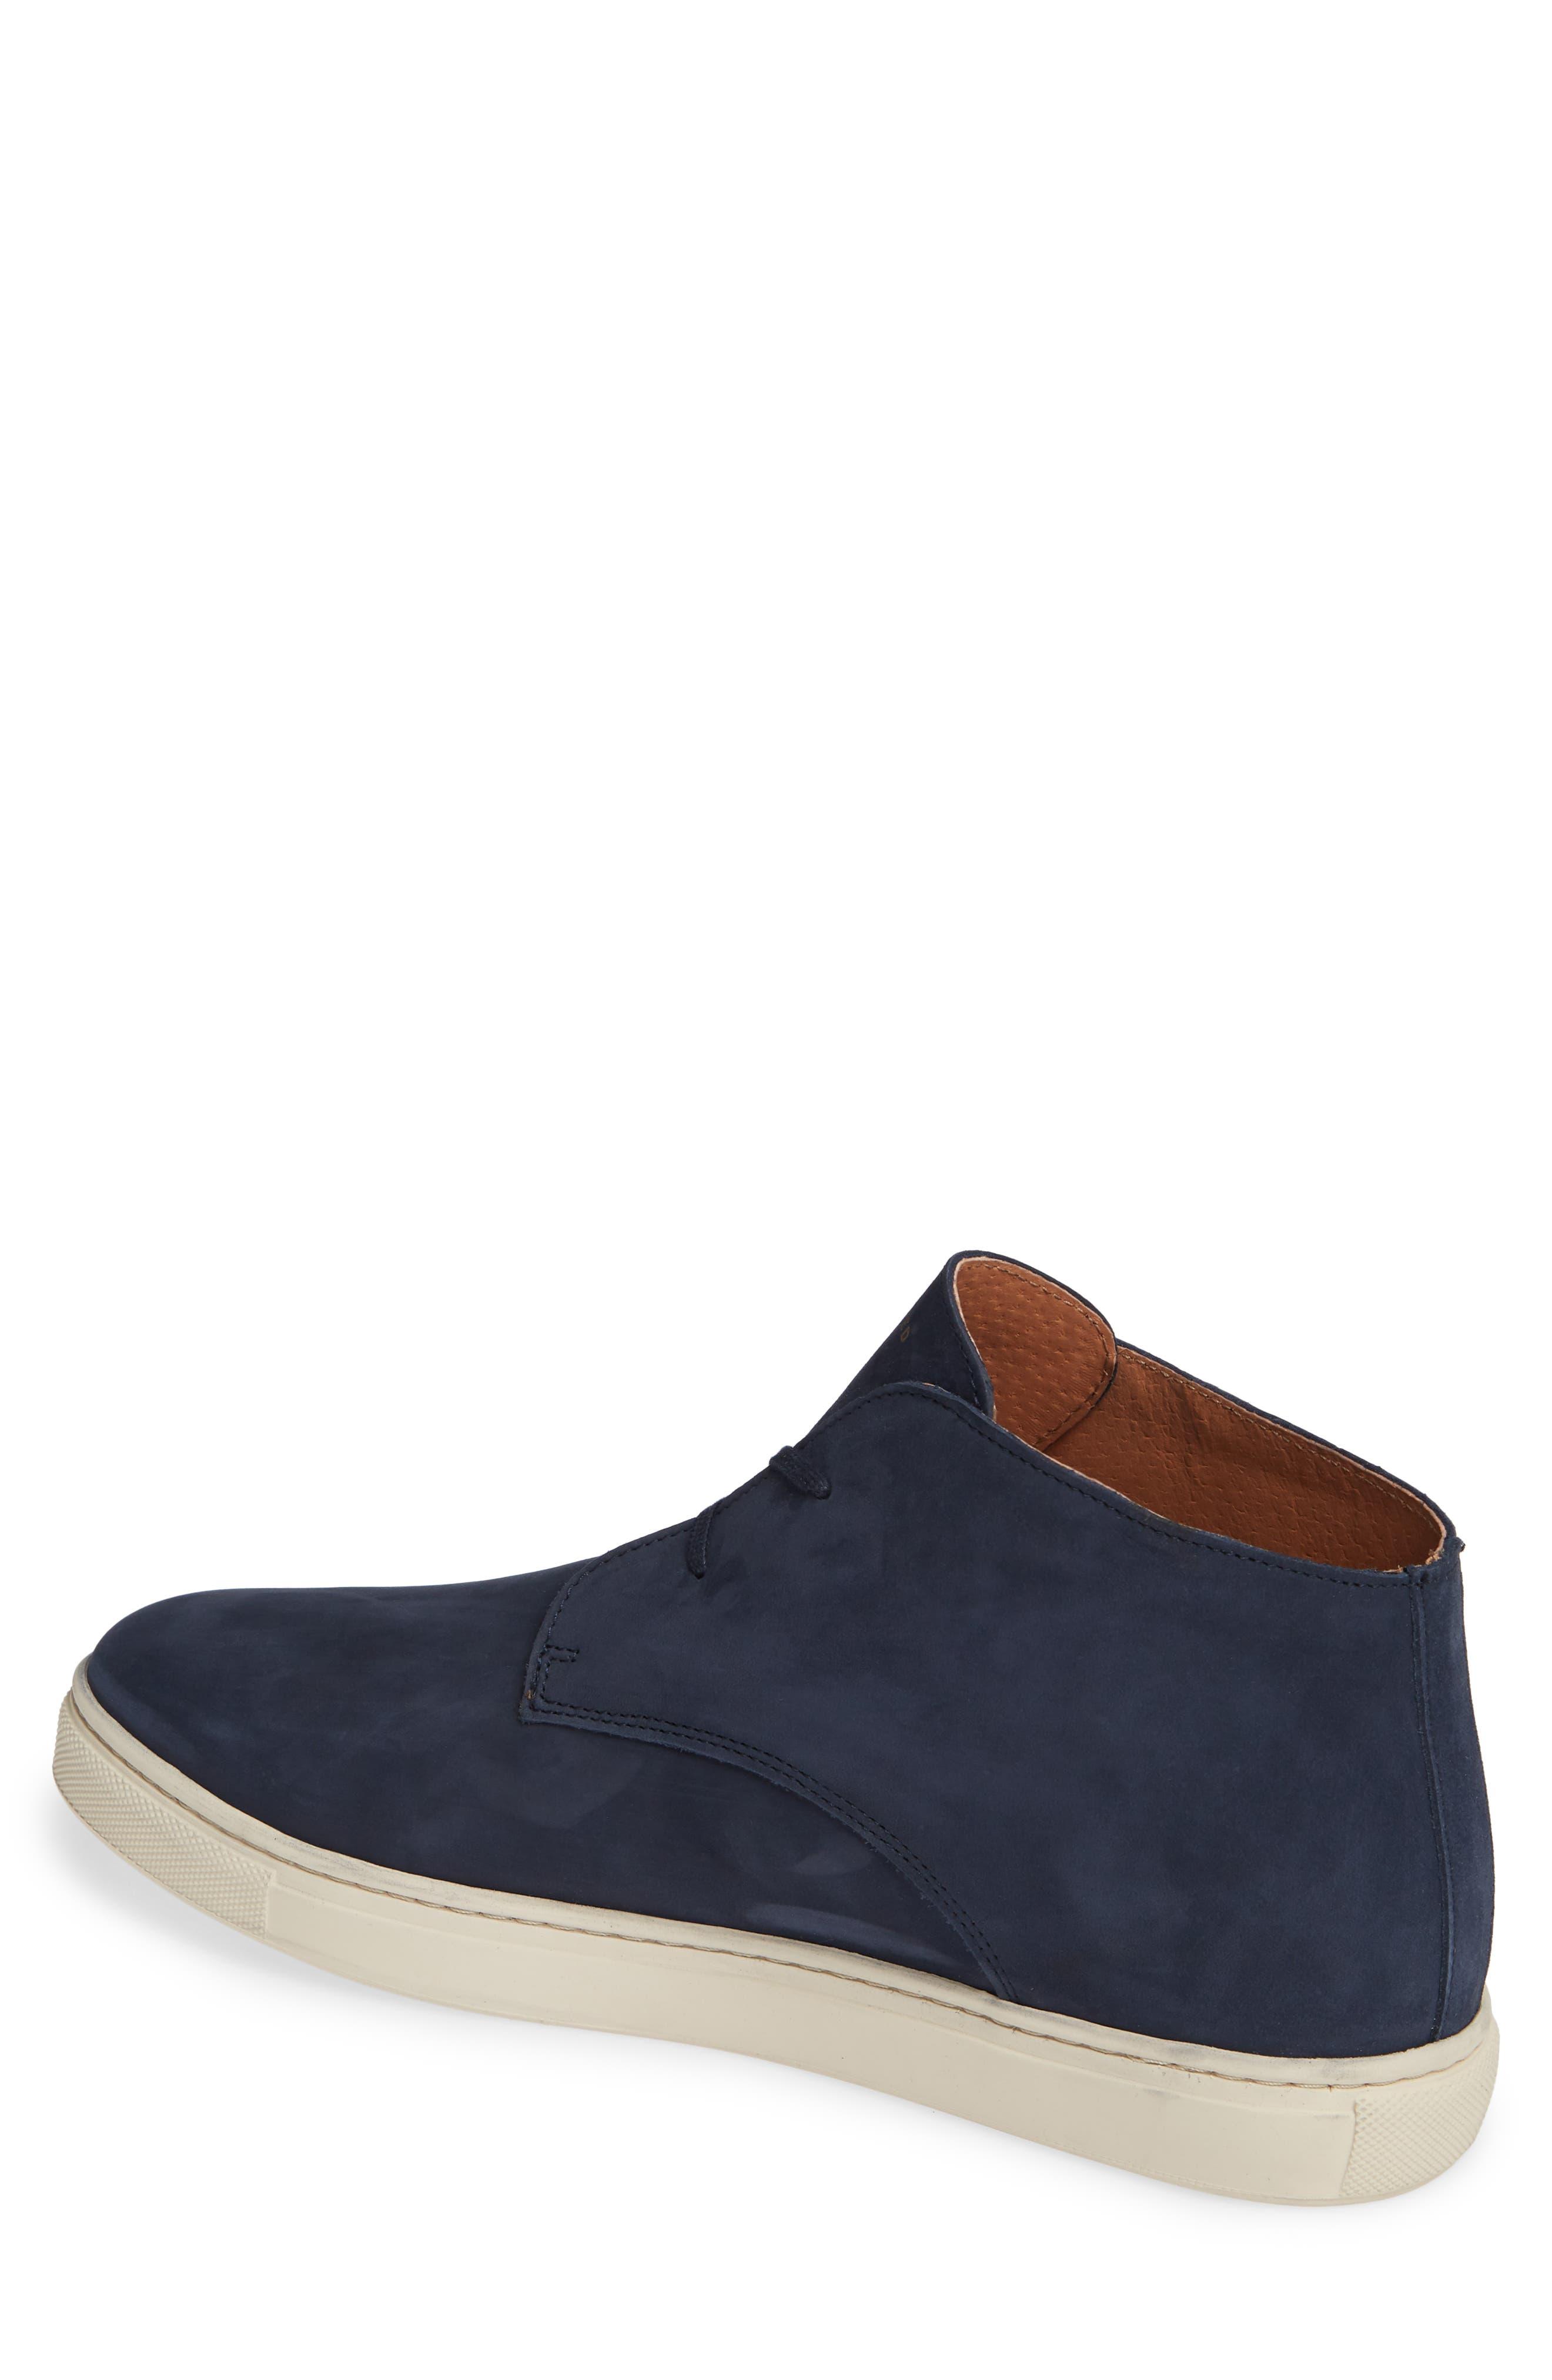 Dempsey Chukka Sneaker,                             Alternate thumbnail 2, color,                             DARK NAVY